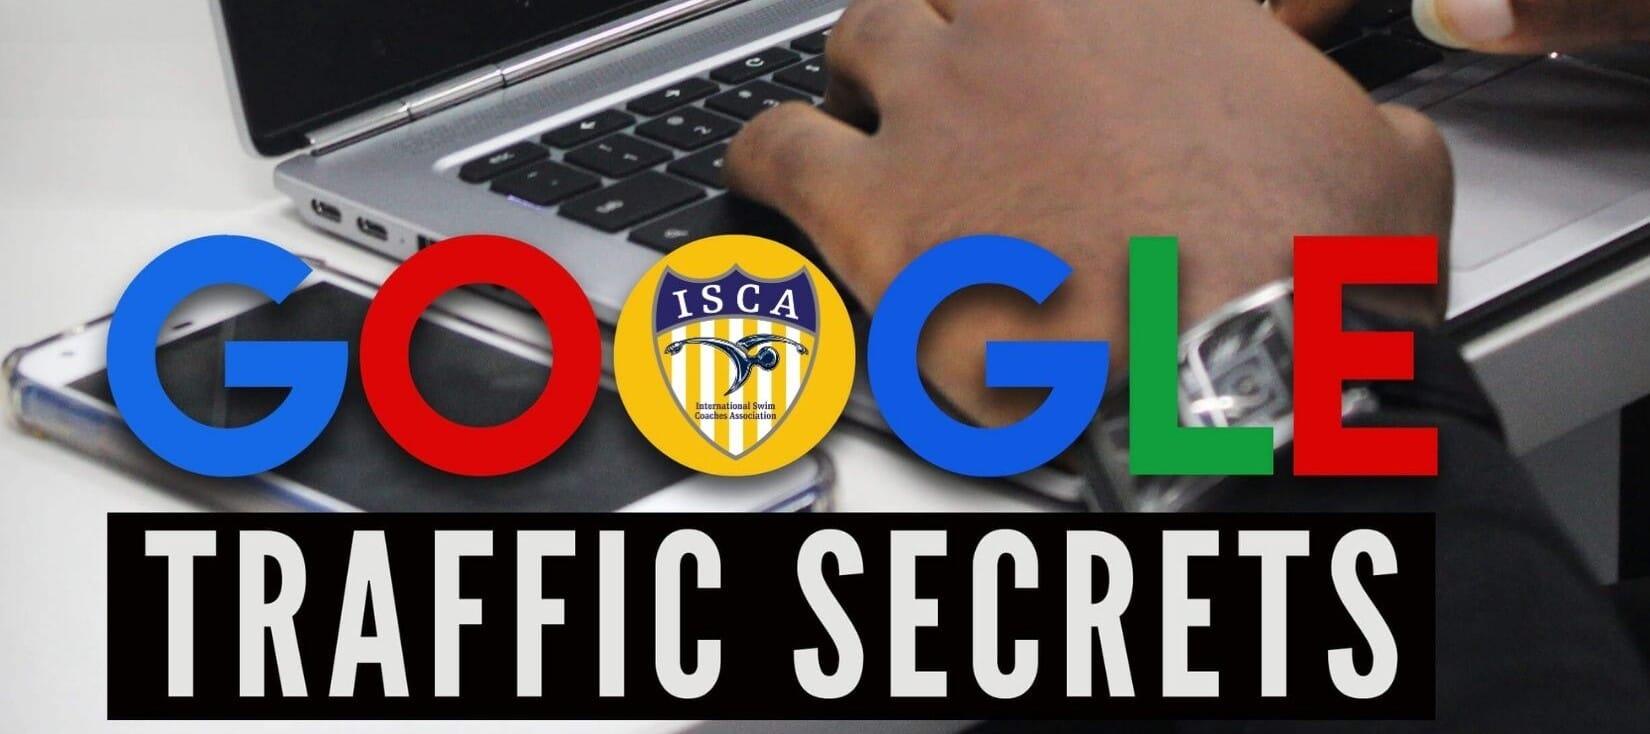 Google Traffic Secrets with ISCA logo